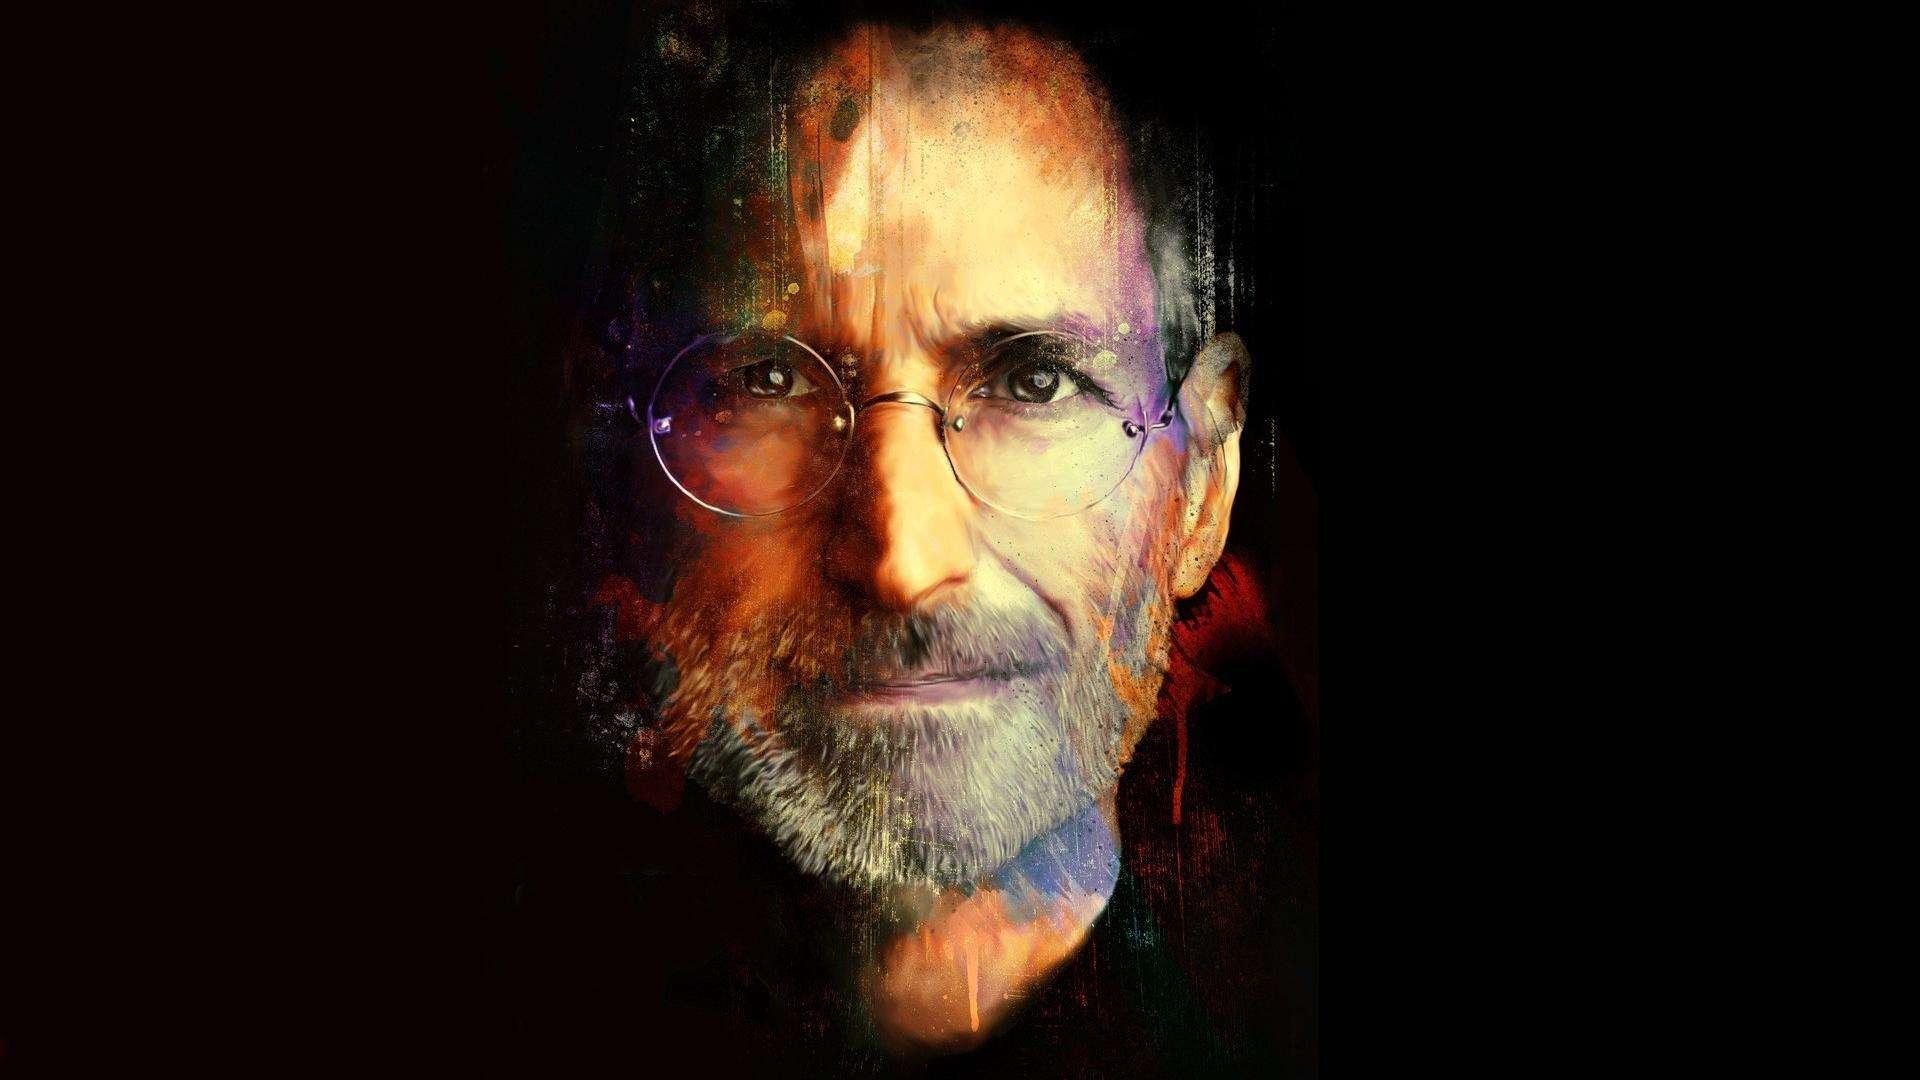 Steve Jobs Kloud Kafe